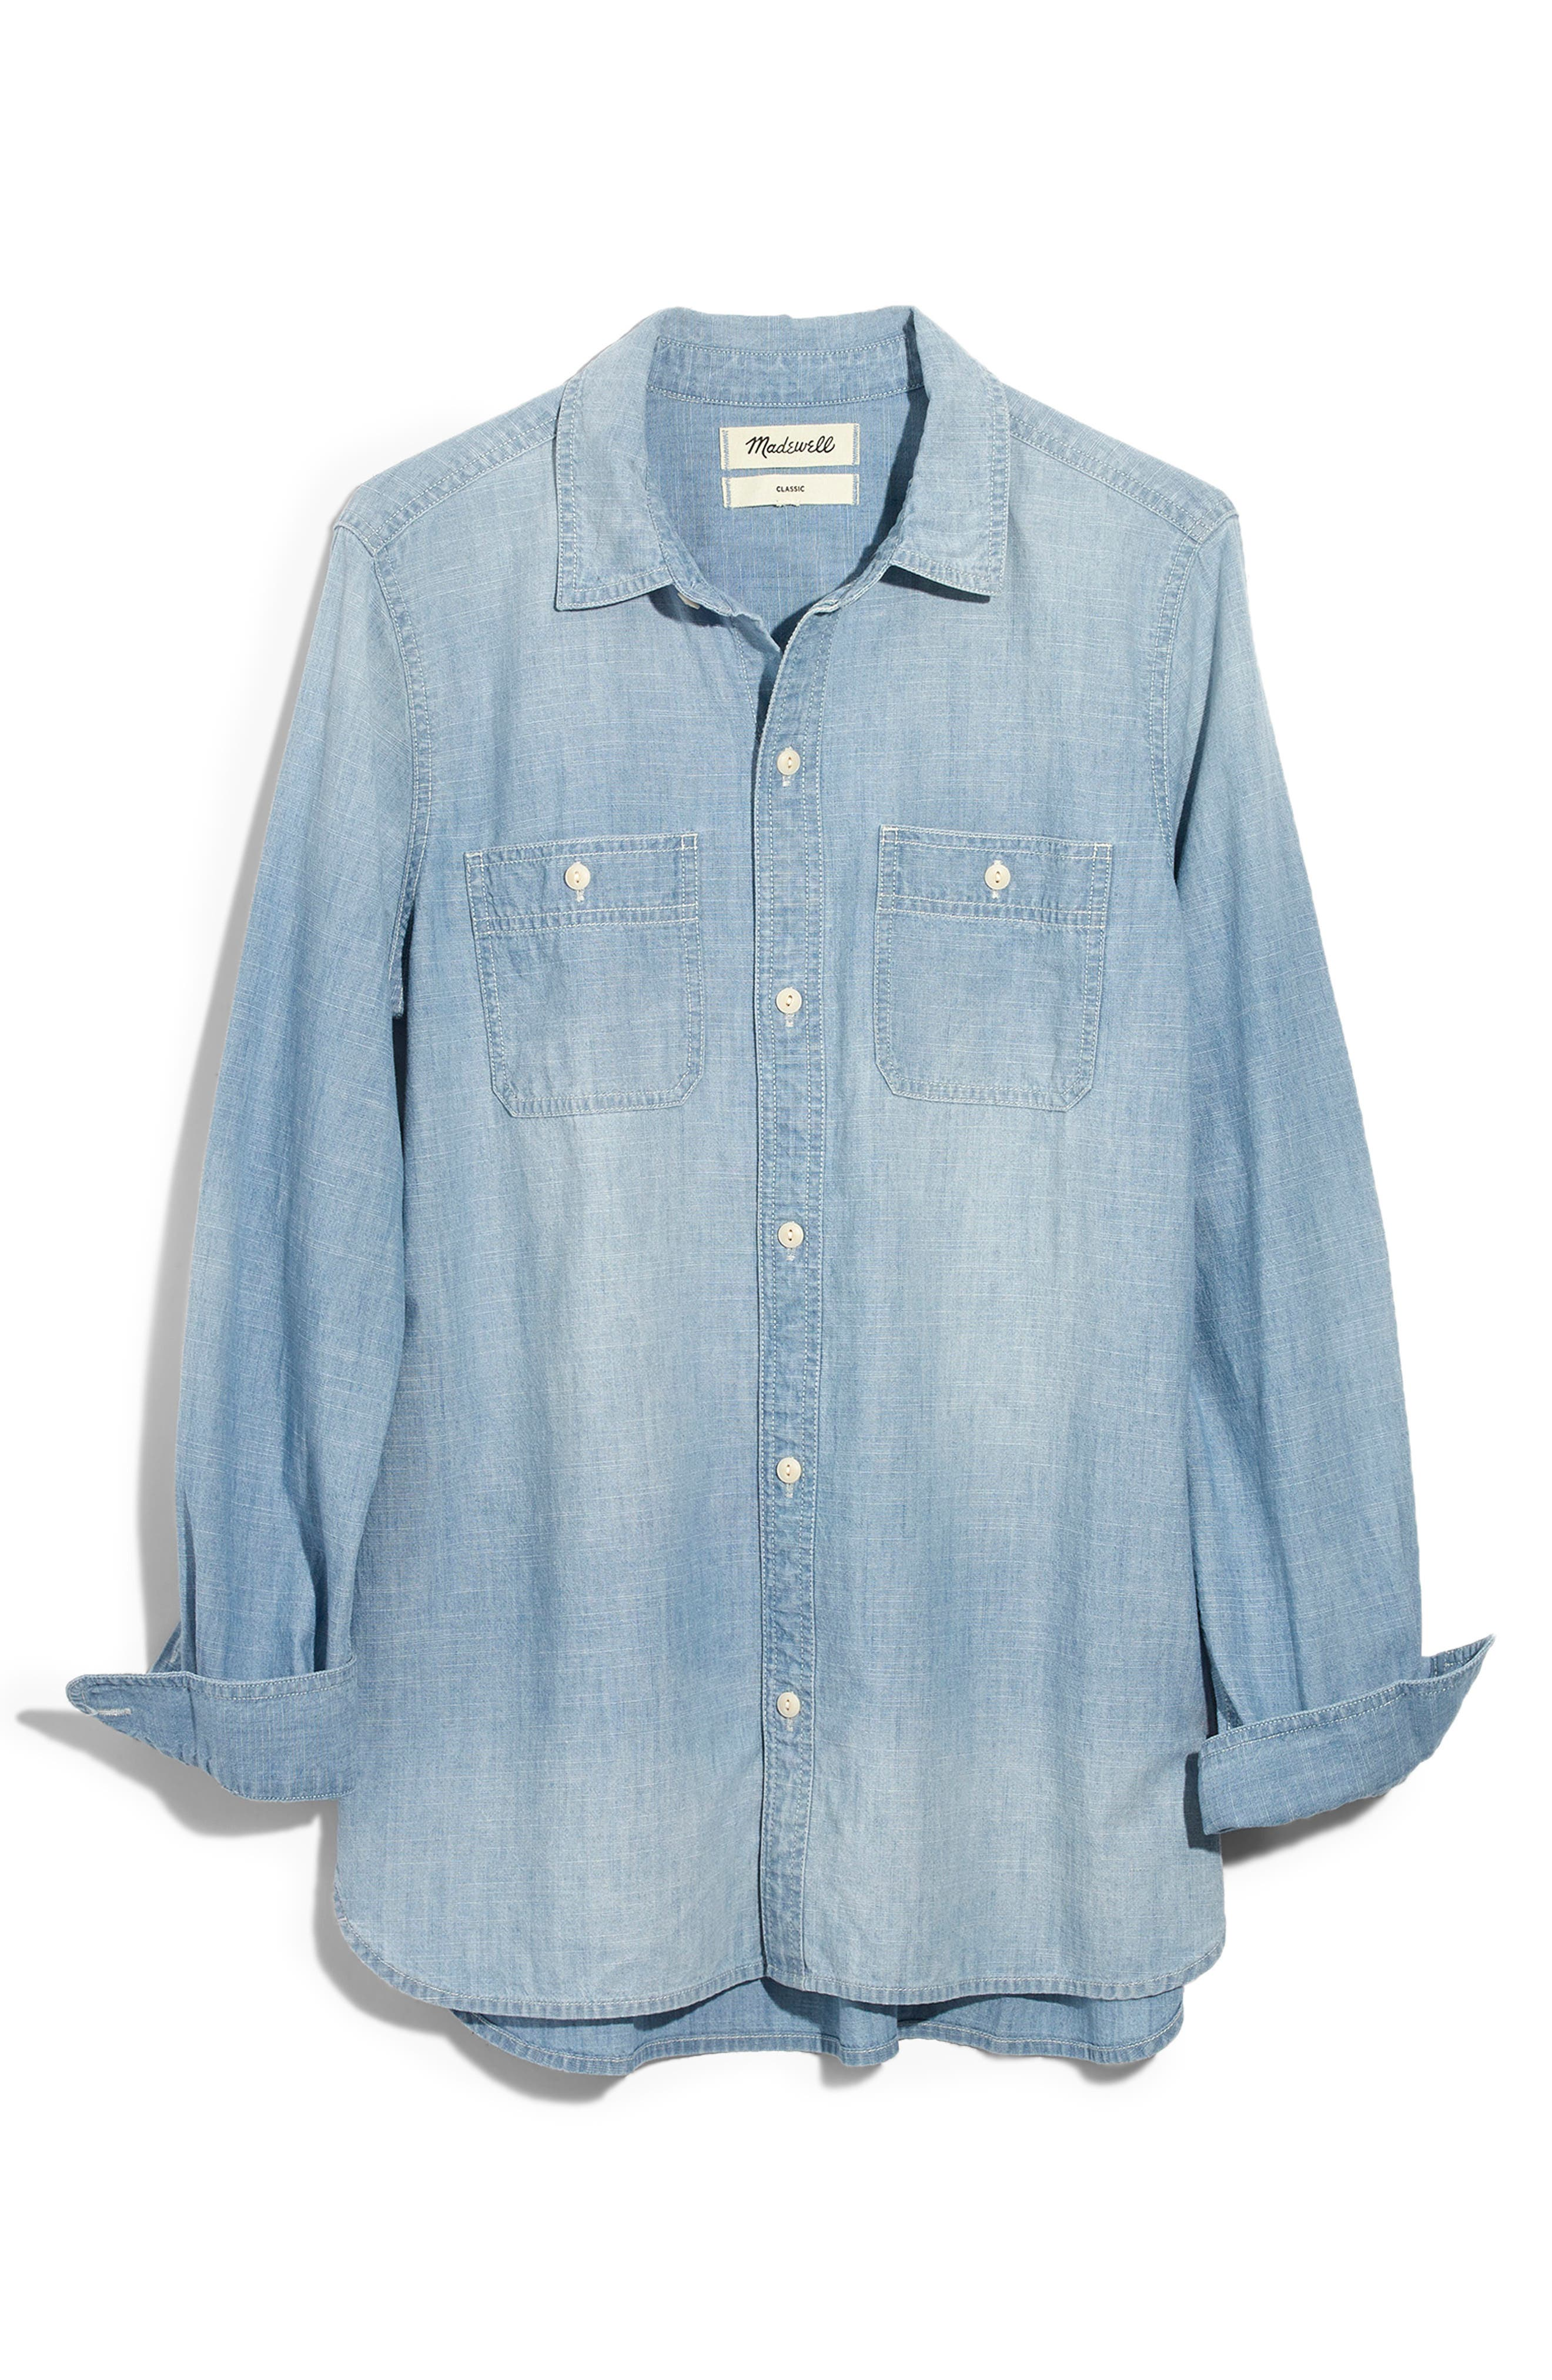 MADEWELL,                             Ex-Boyfriend Classic Chambray Shirt,                             Alternate thumbnail 4, color,                             EVIE WASH